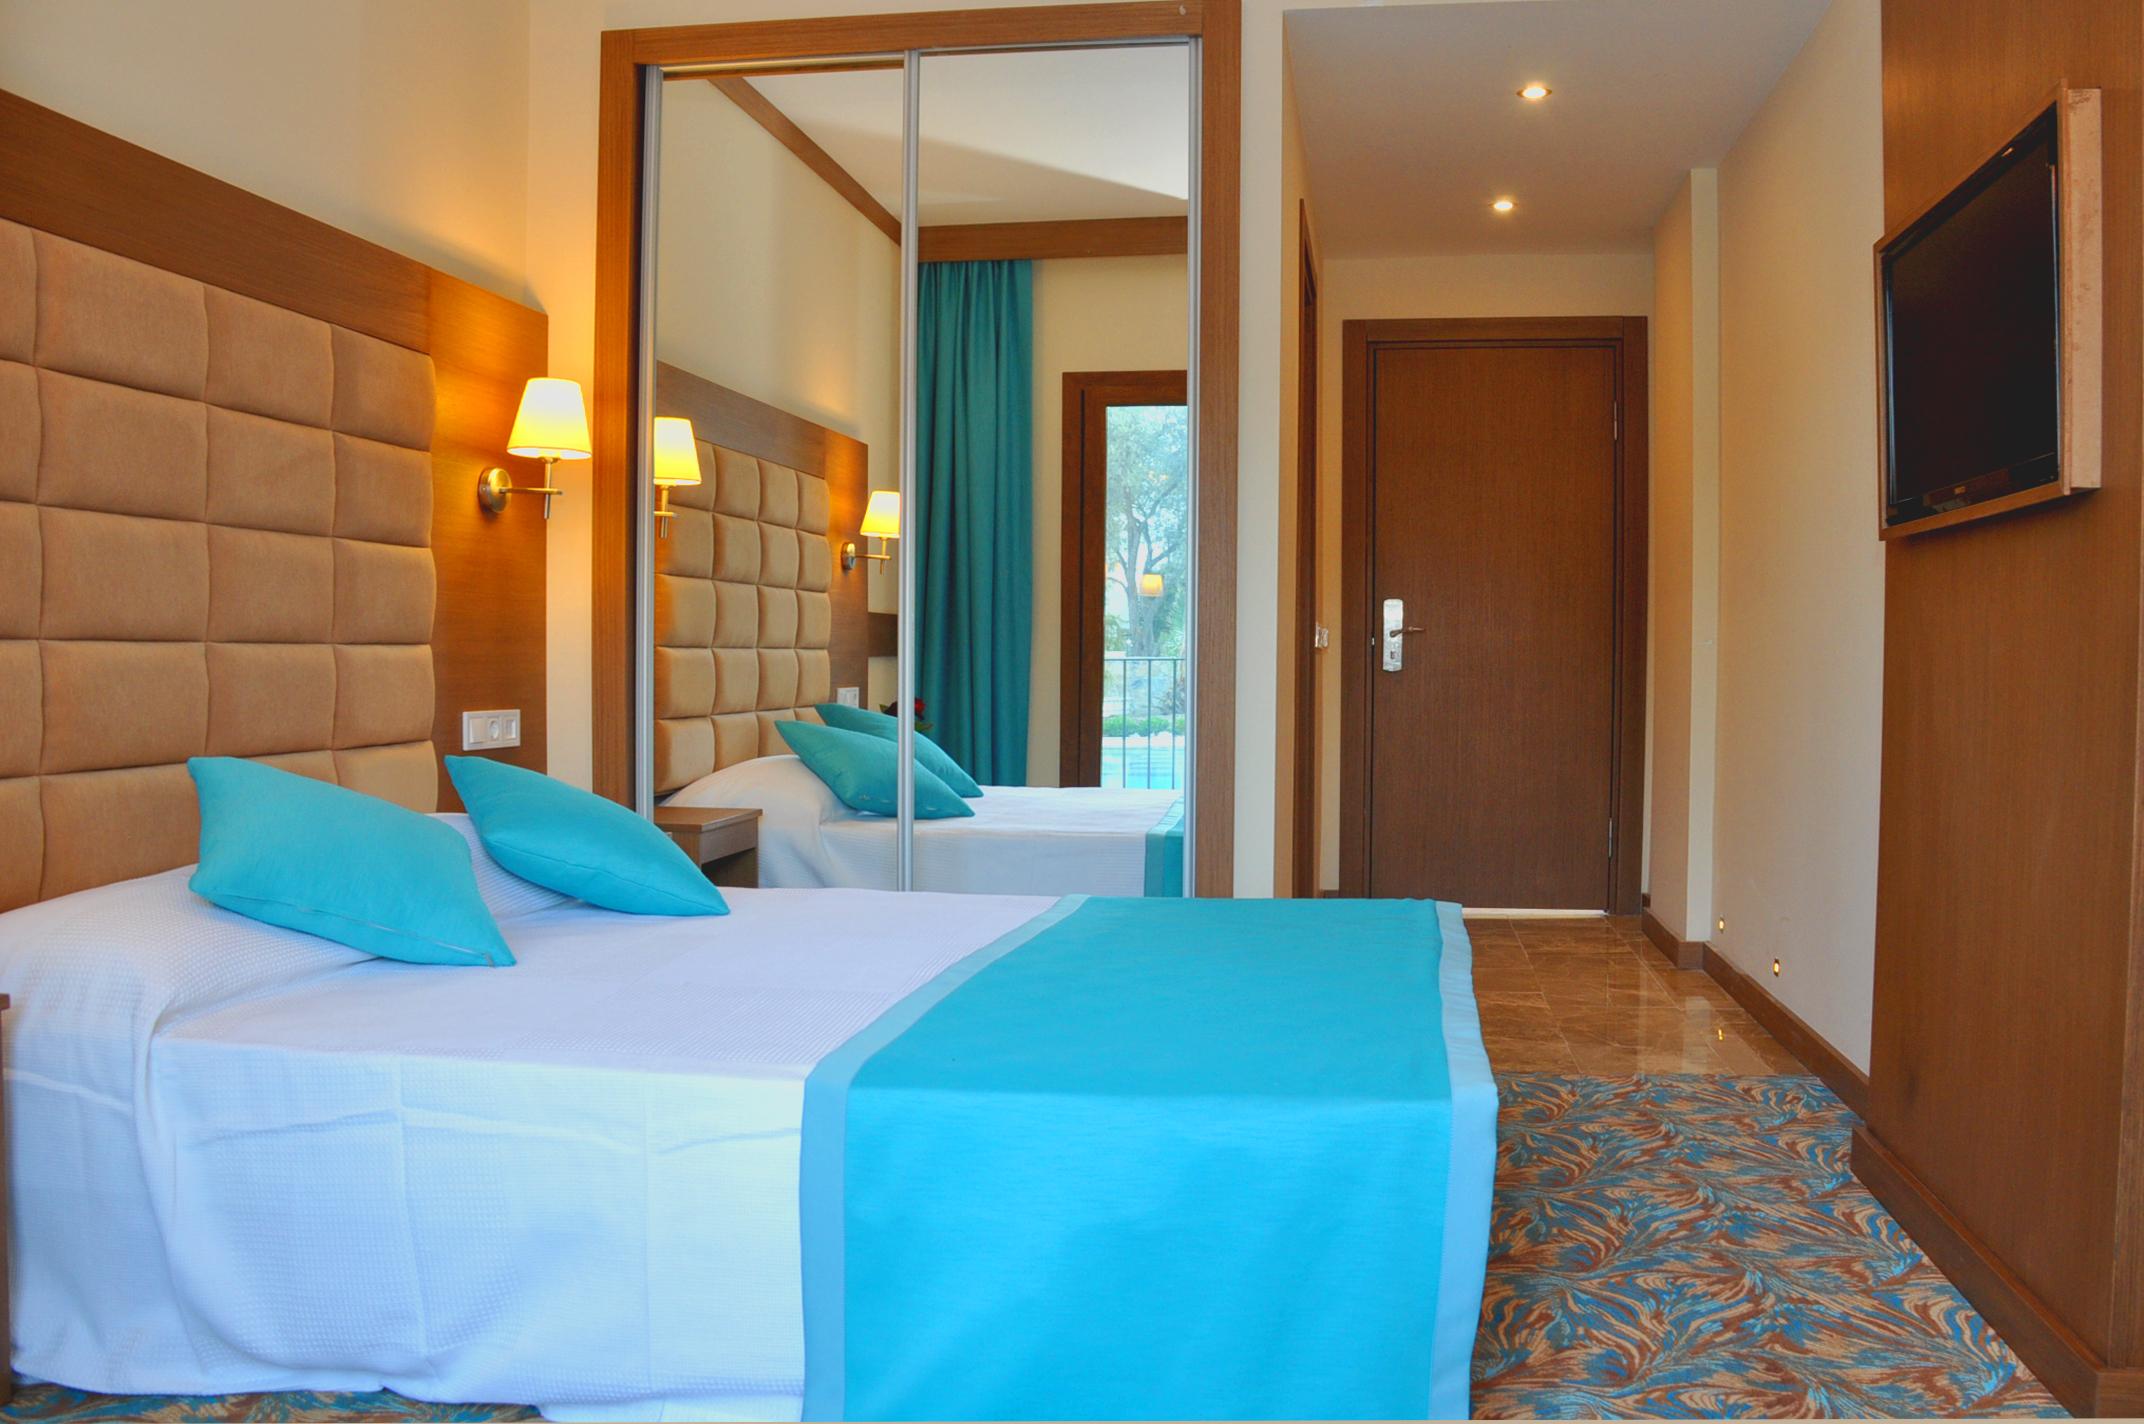 Liona Hotel Gündoğan (15)